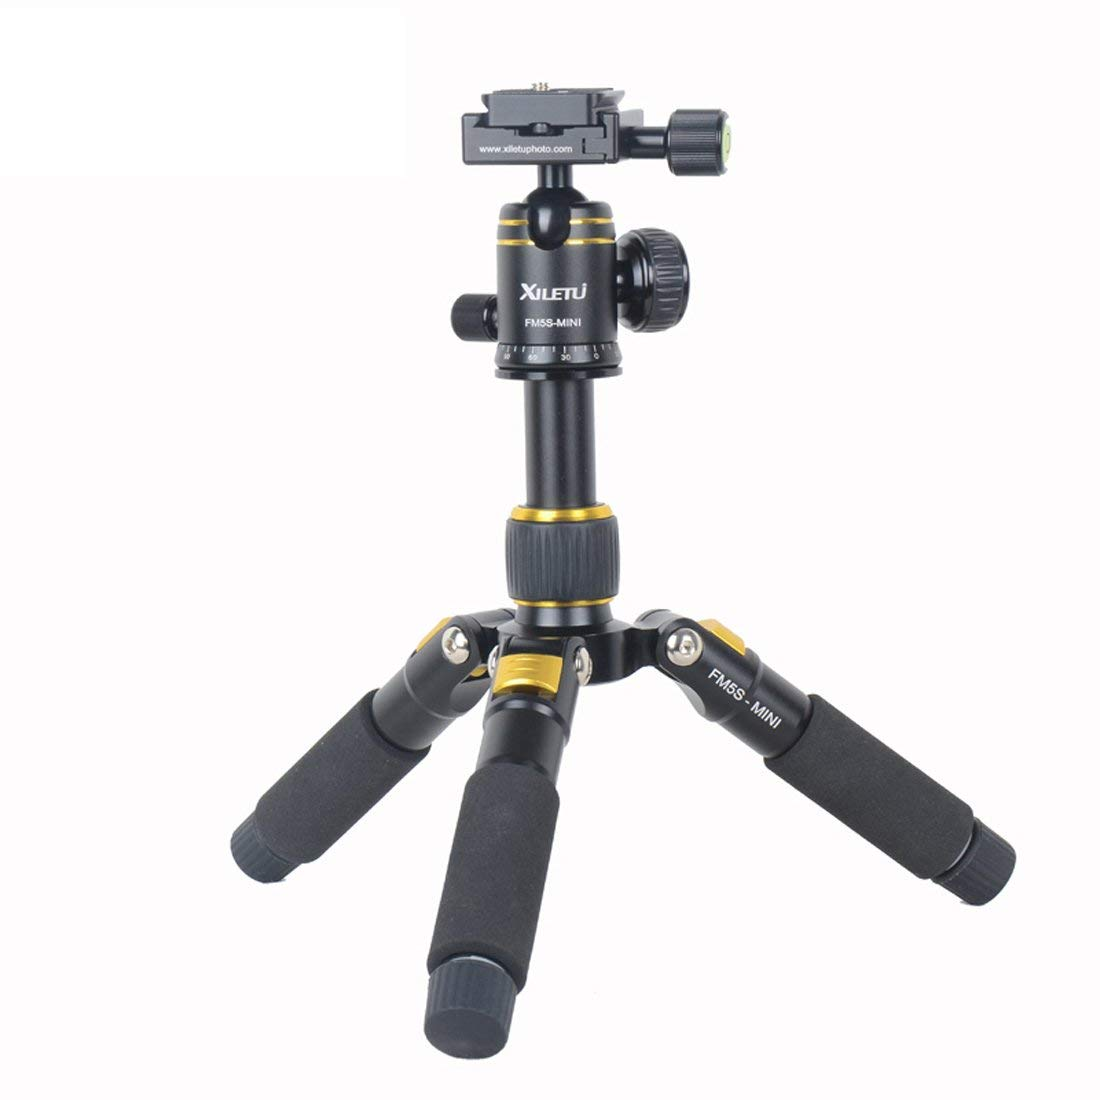 XILETU FM5S Mini Tabletop Tripod and Ball Head Kit For DSLR Mirrorless Camera Smart phone Lightweight